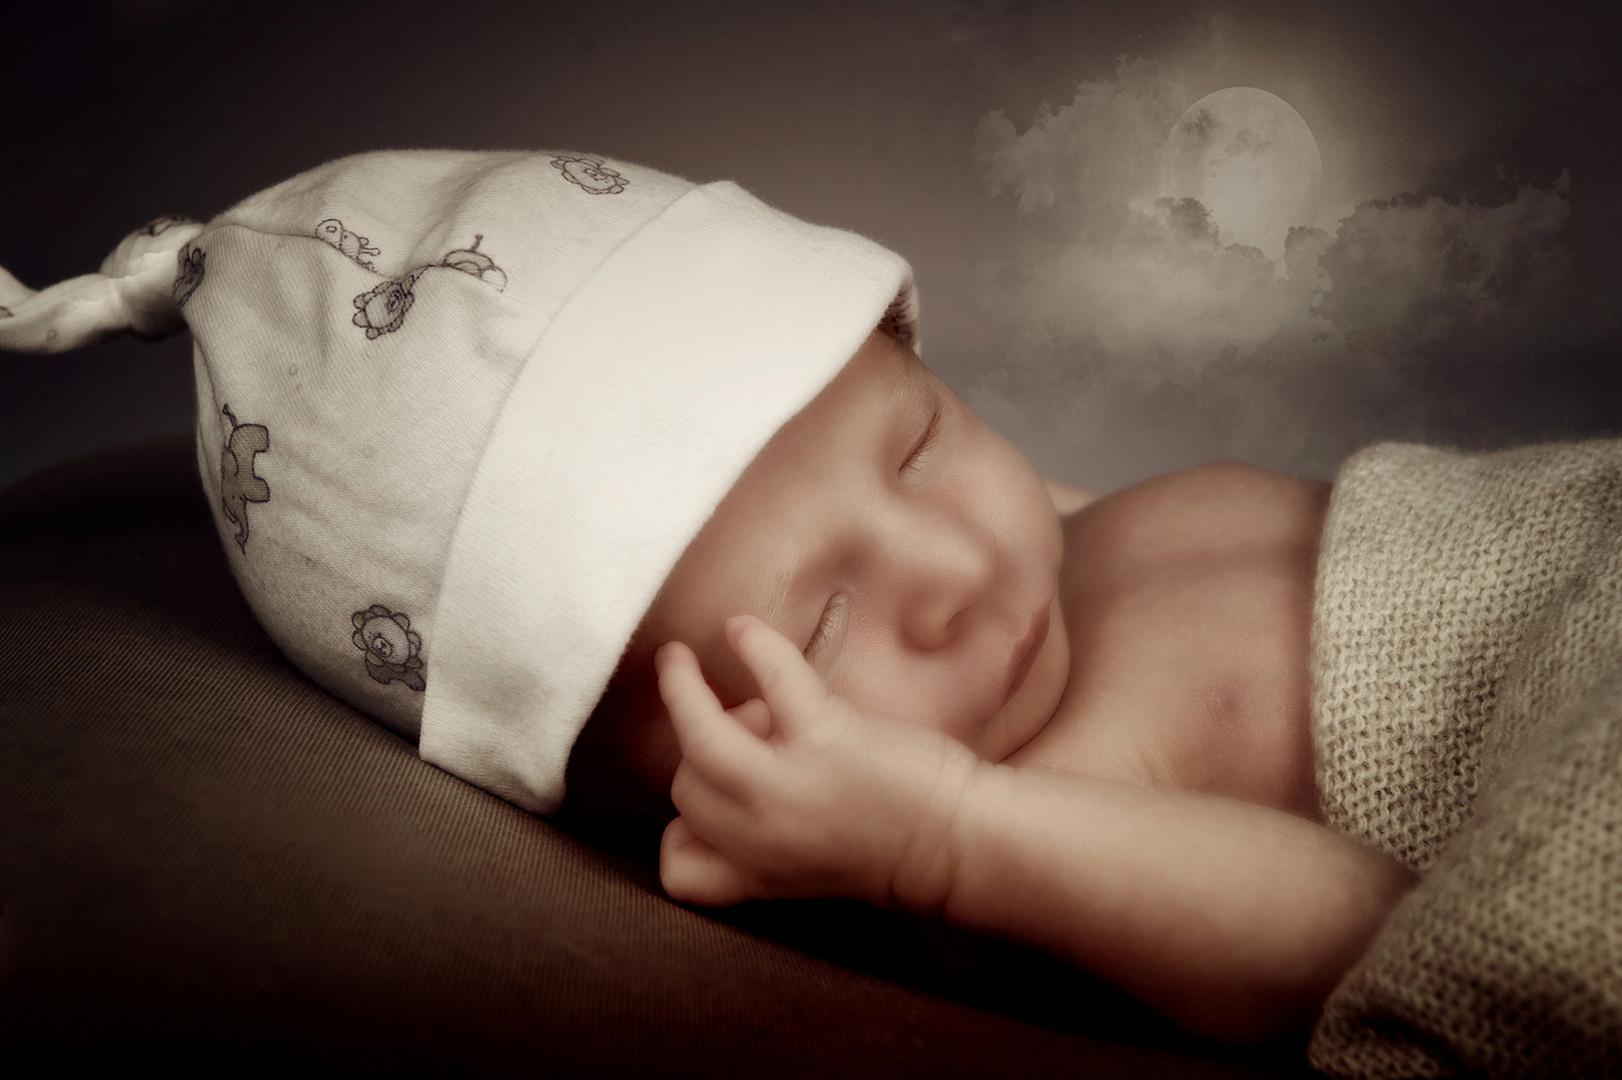 ....schlaf Kindlein schlaf.....